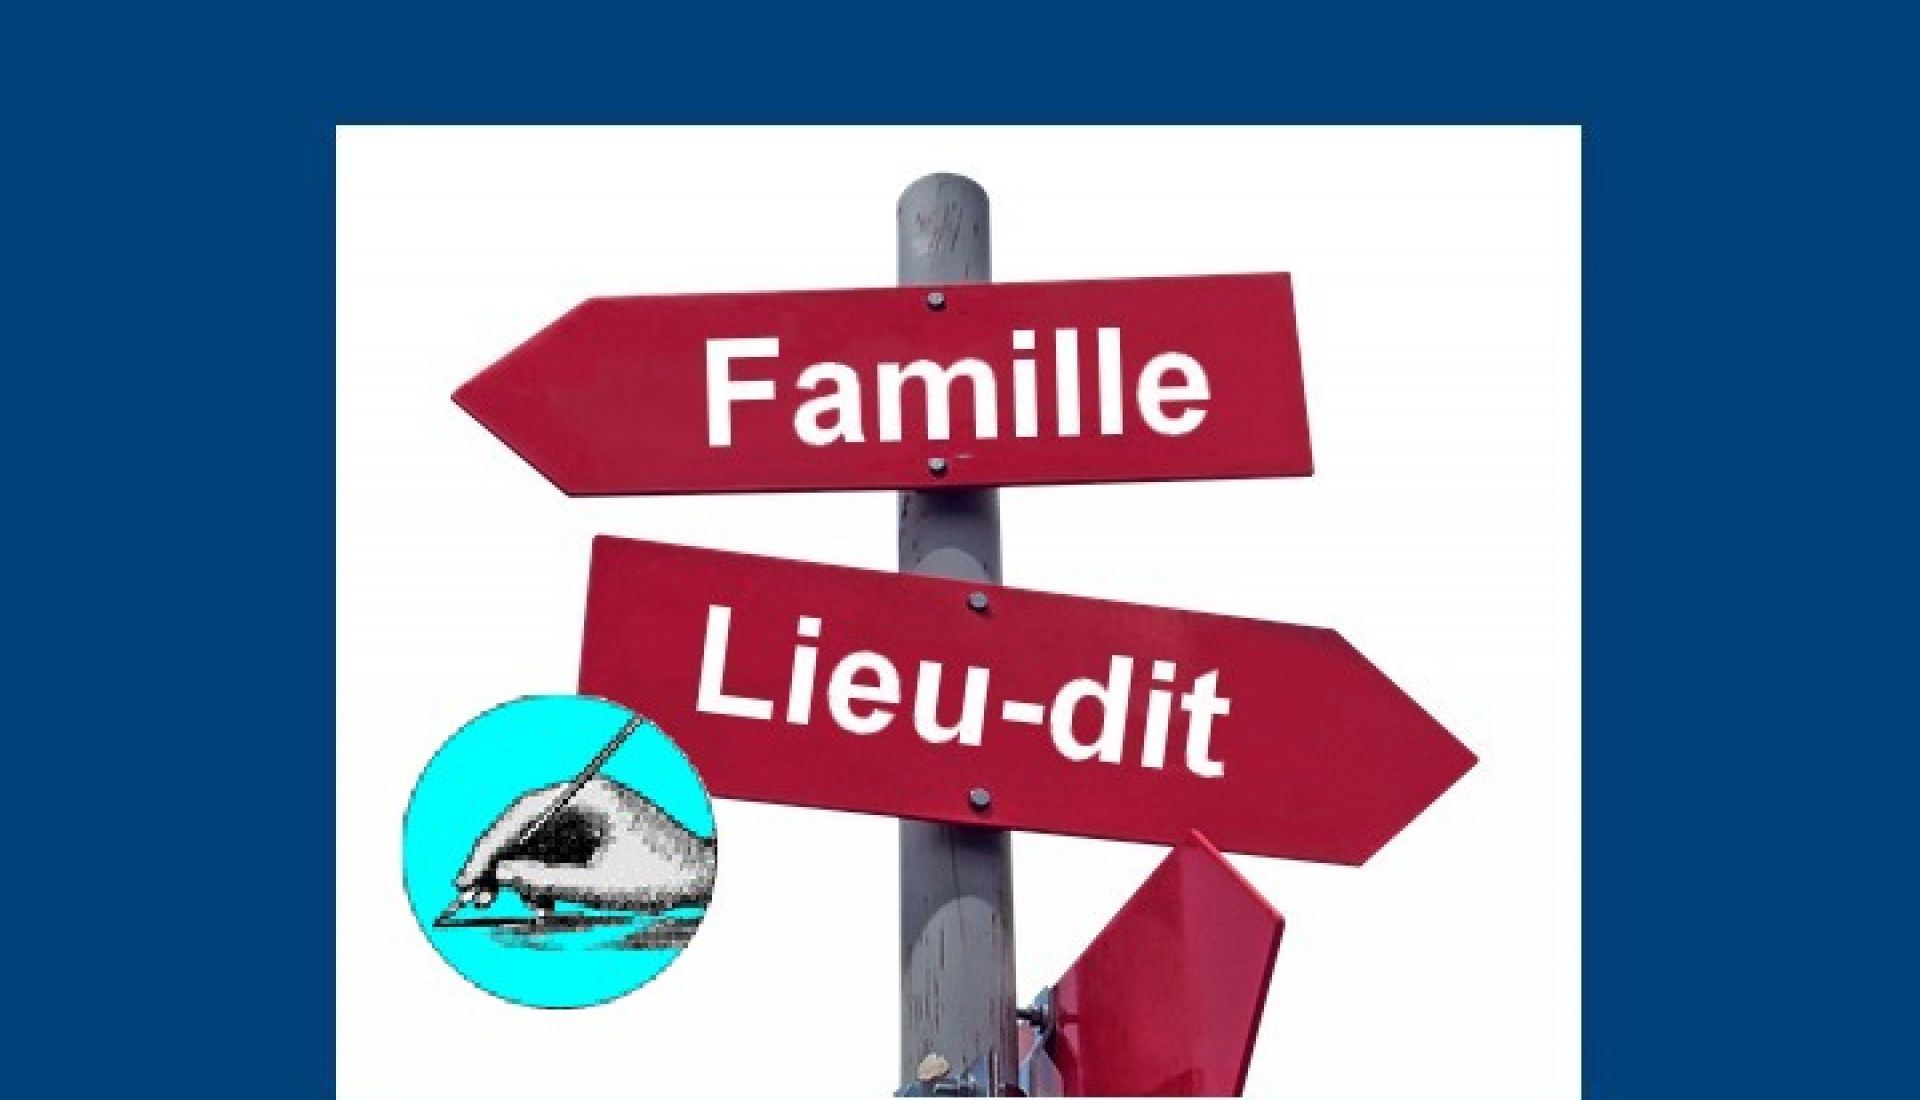 Patronymes et toponymes : étymologie